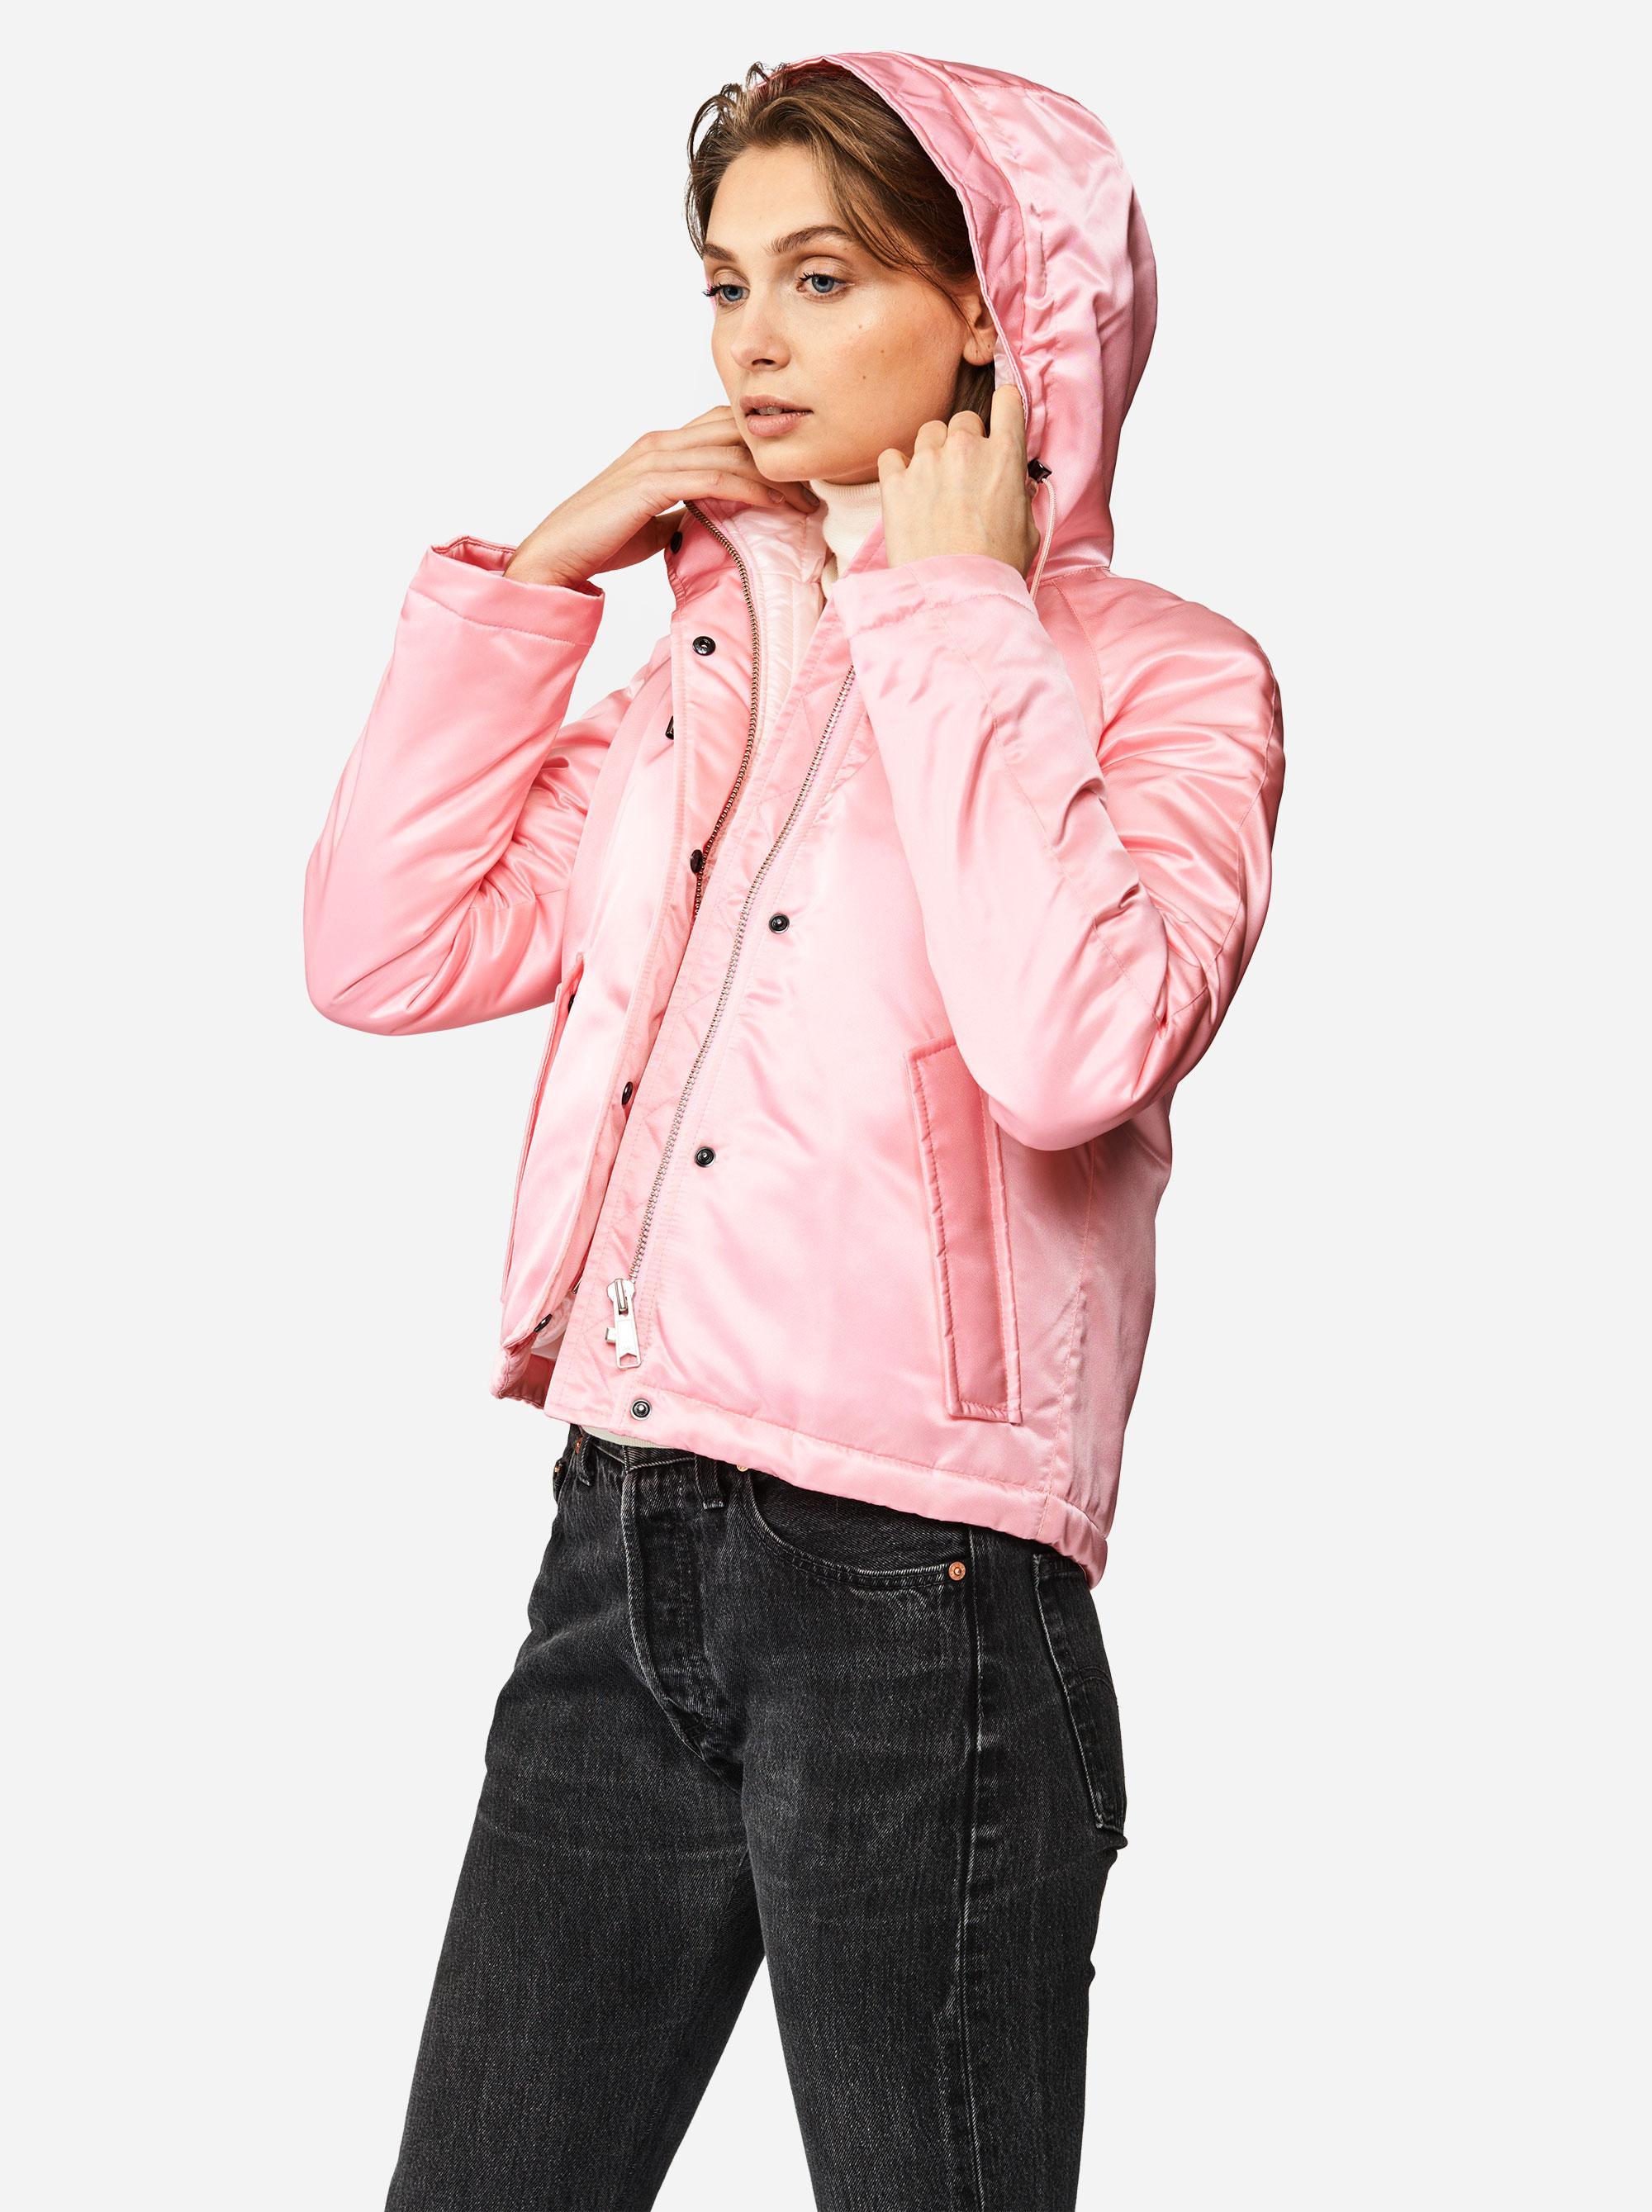 Teym - The Parka - Women - Pink - Short - 1